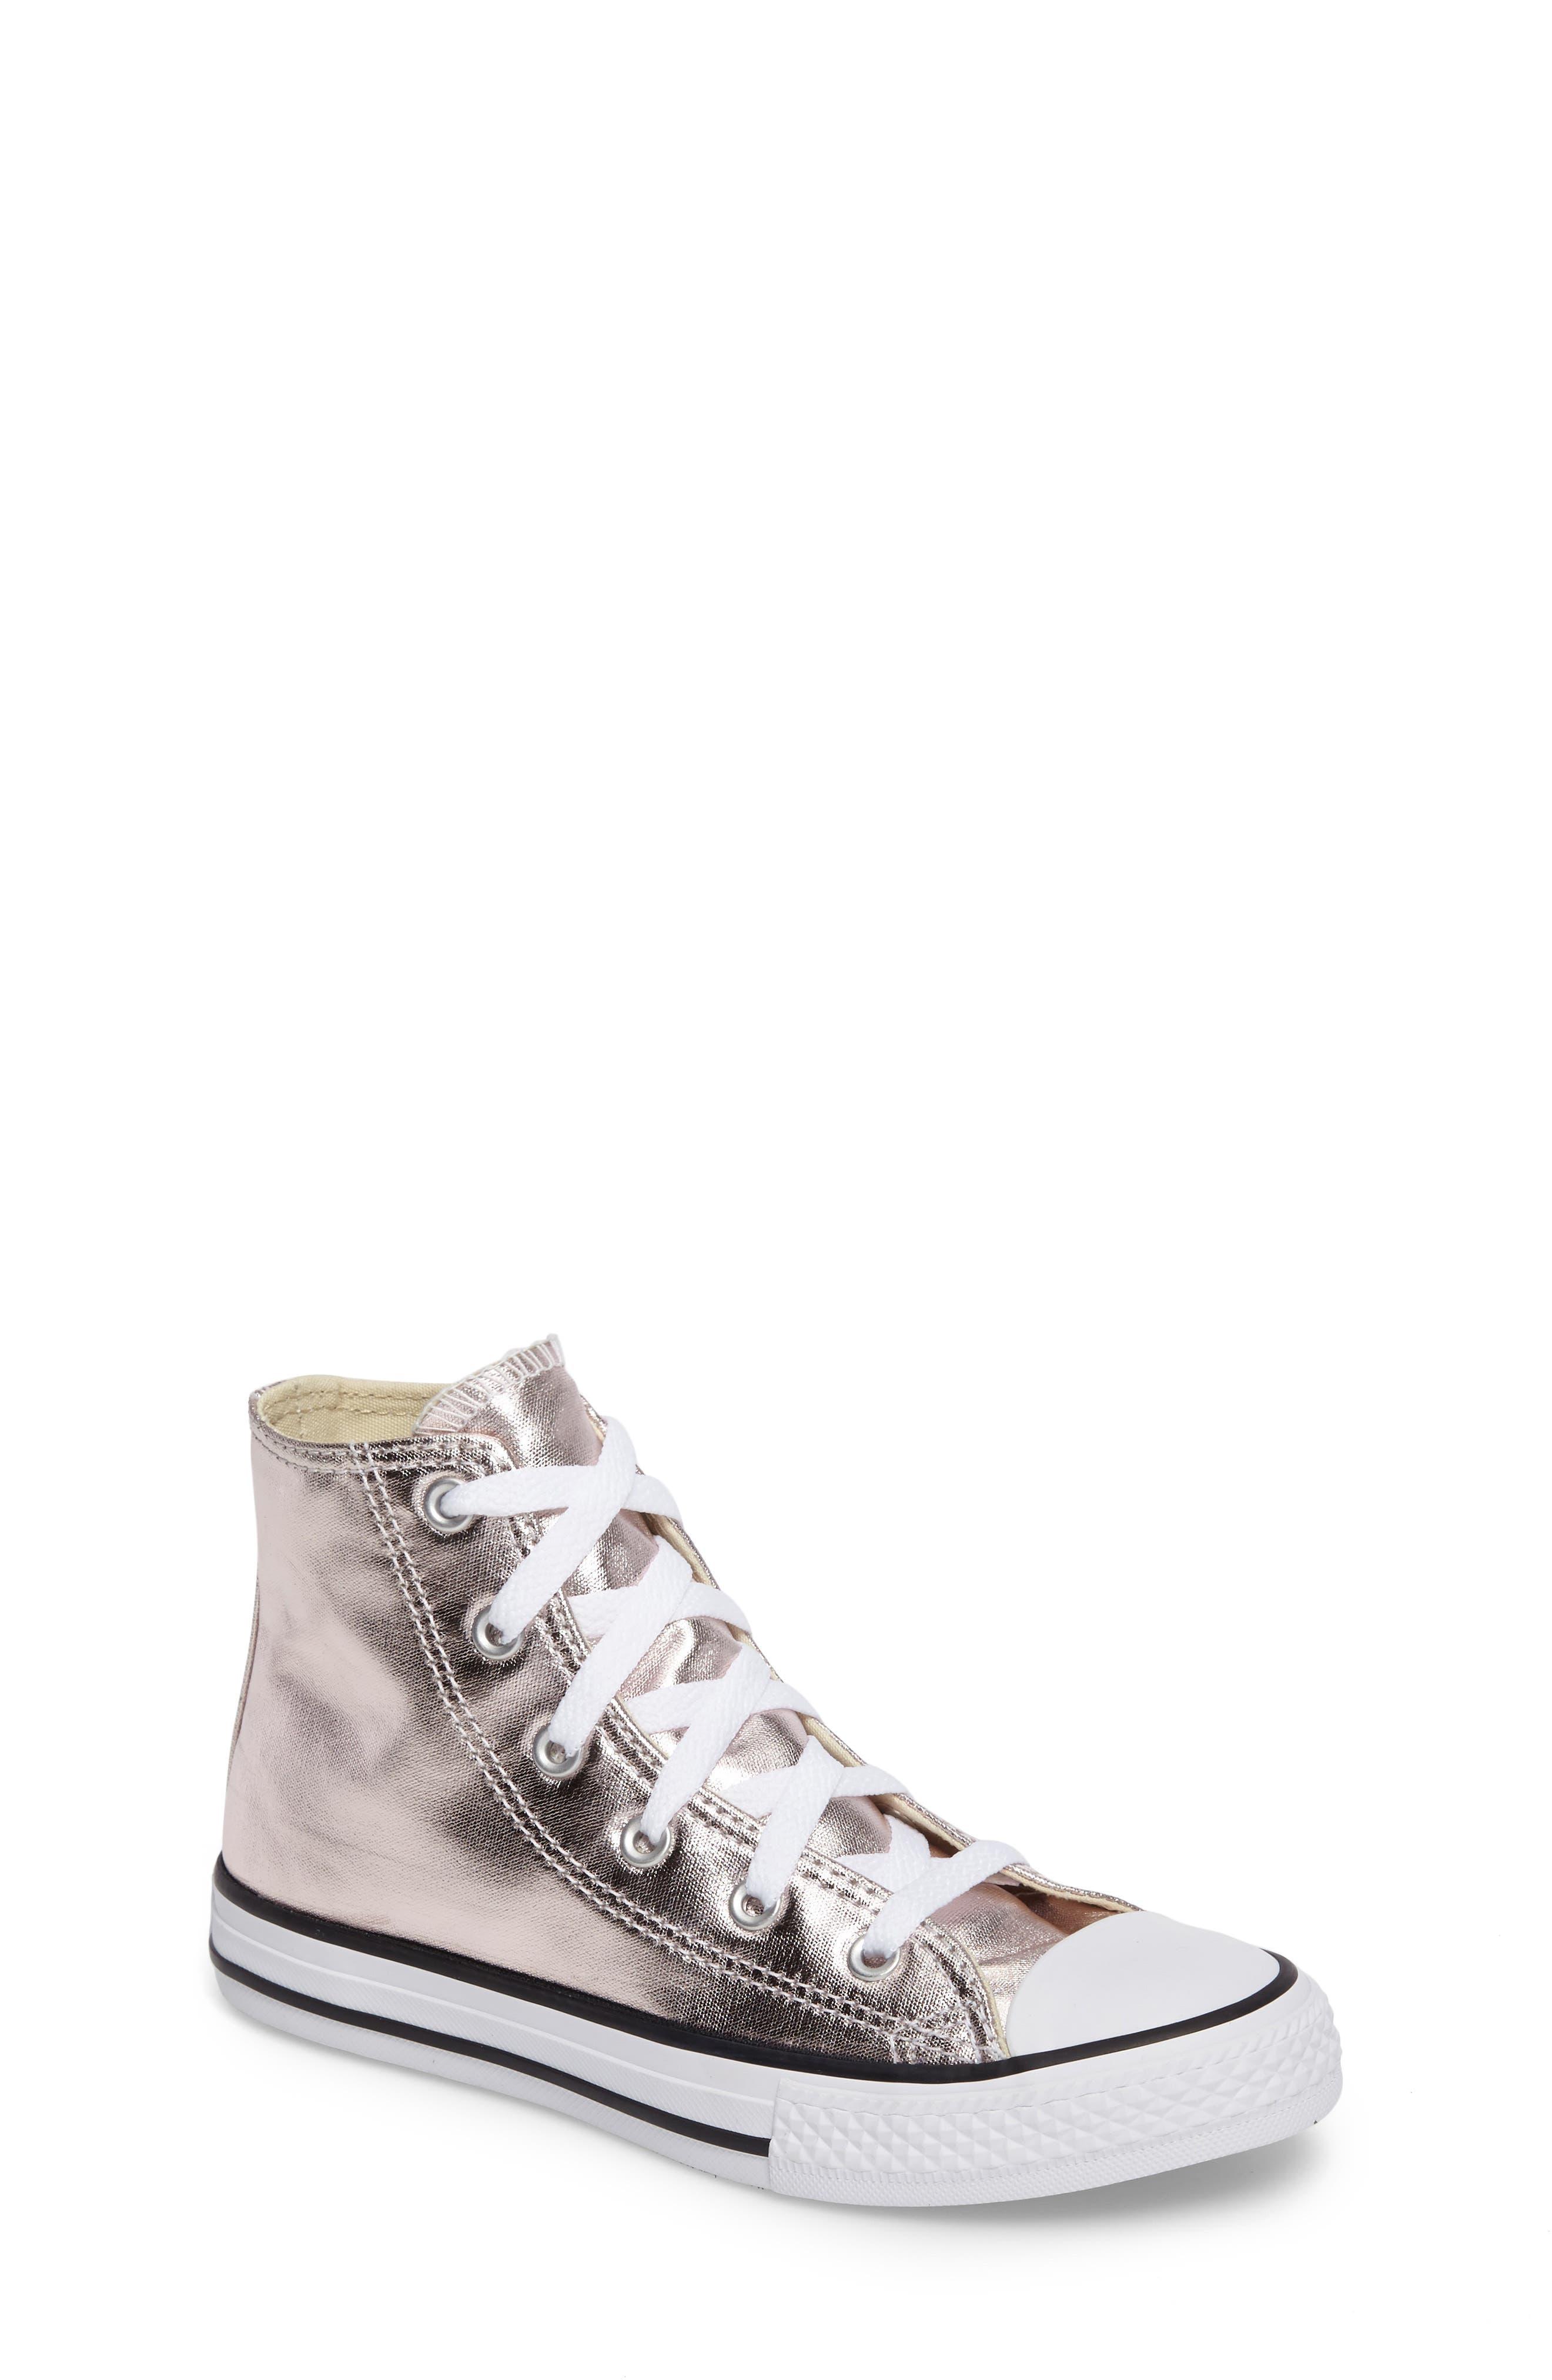 Alternate Image 1 Selected - Converse Chuck Taylor® All Star® Seasonal Metallic High Top Sneaker (Toddler & Little Kid)